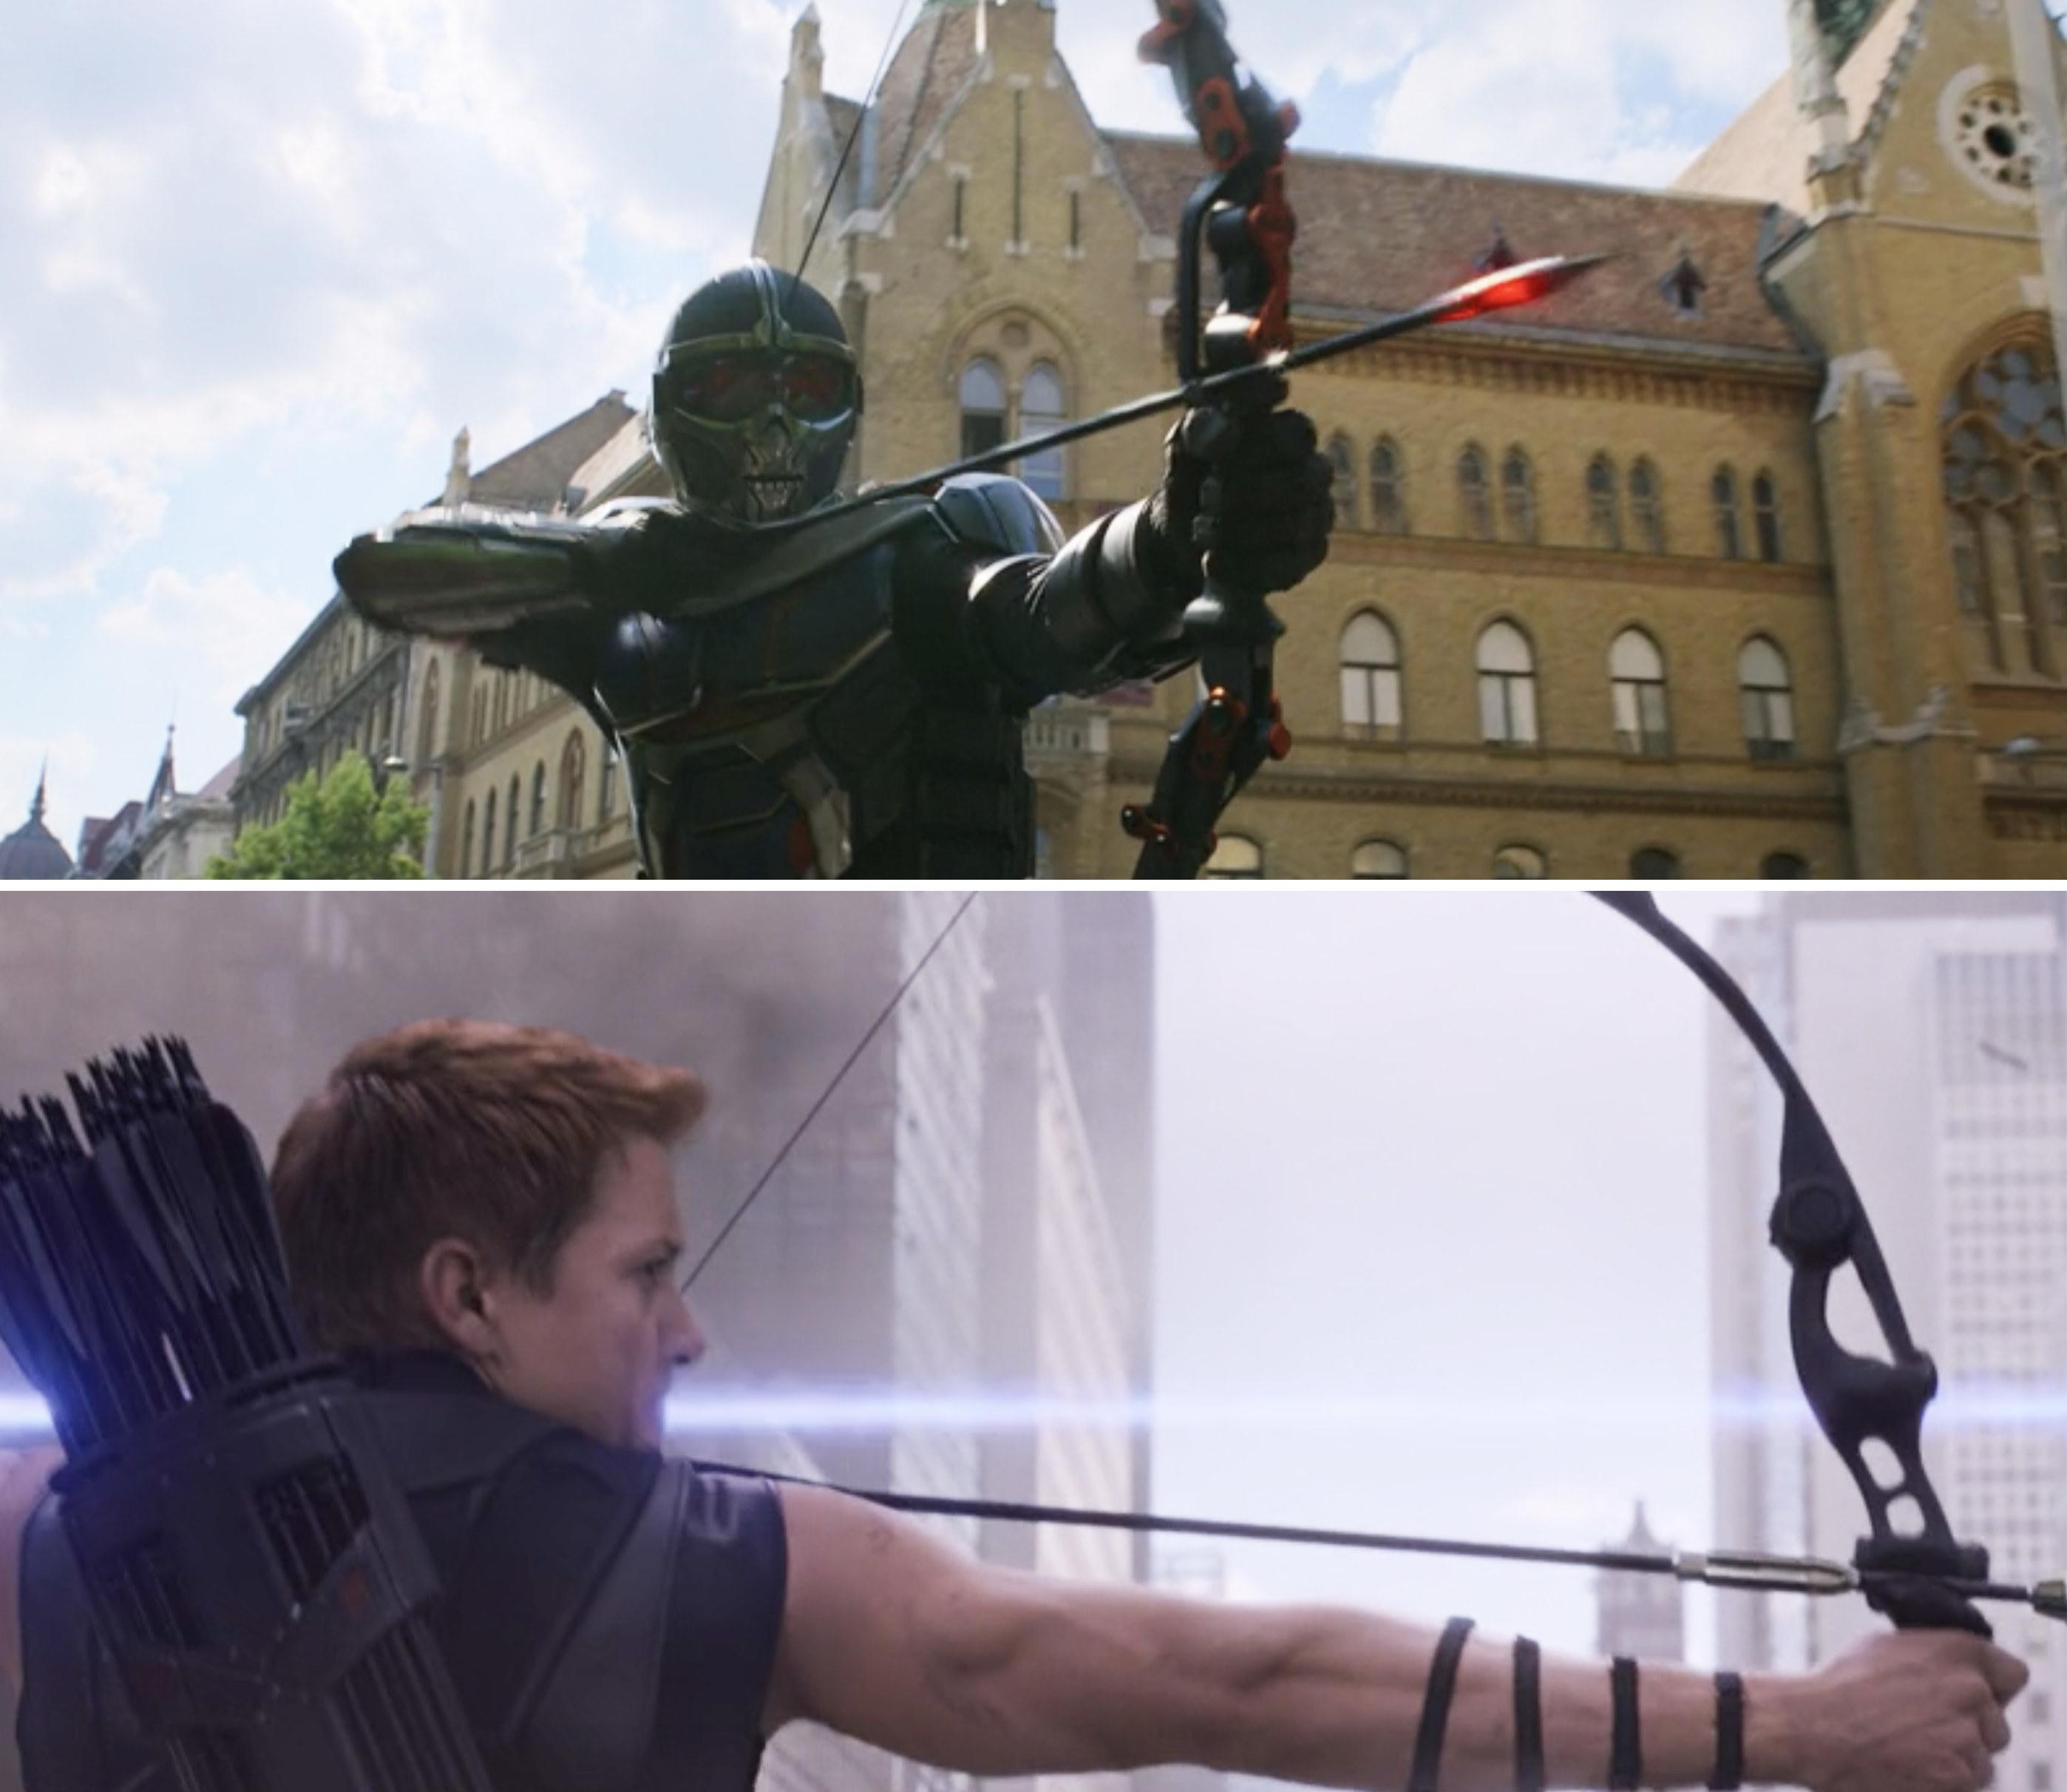 Taskmaster shooting an arrow vs. Clint shooting one